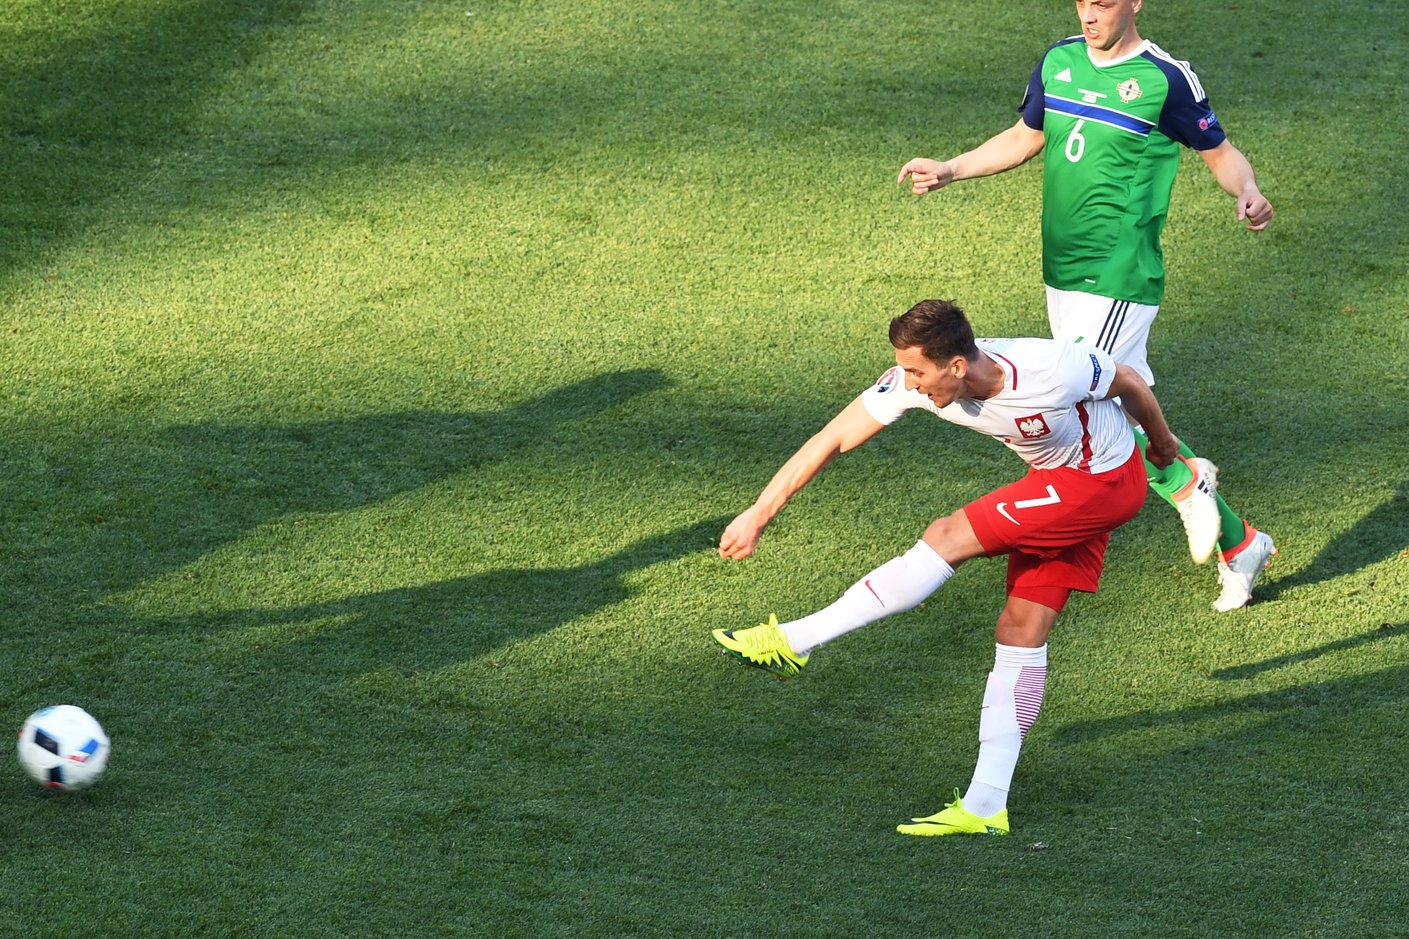 Poland's forward Arkadiusz Milik scores a goal during the Euro 2016 group C football match between Poland and Northern Ireland at the Stade de Nice in Nice on June 12, 2016. / AFP / BORIS HORVAT (Photo credit should read BORIS HORVAT/AFP/Getty Images)